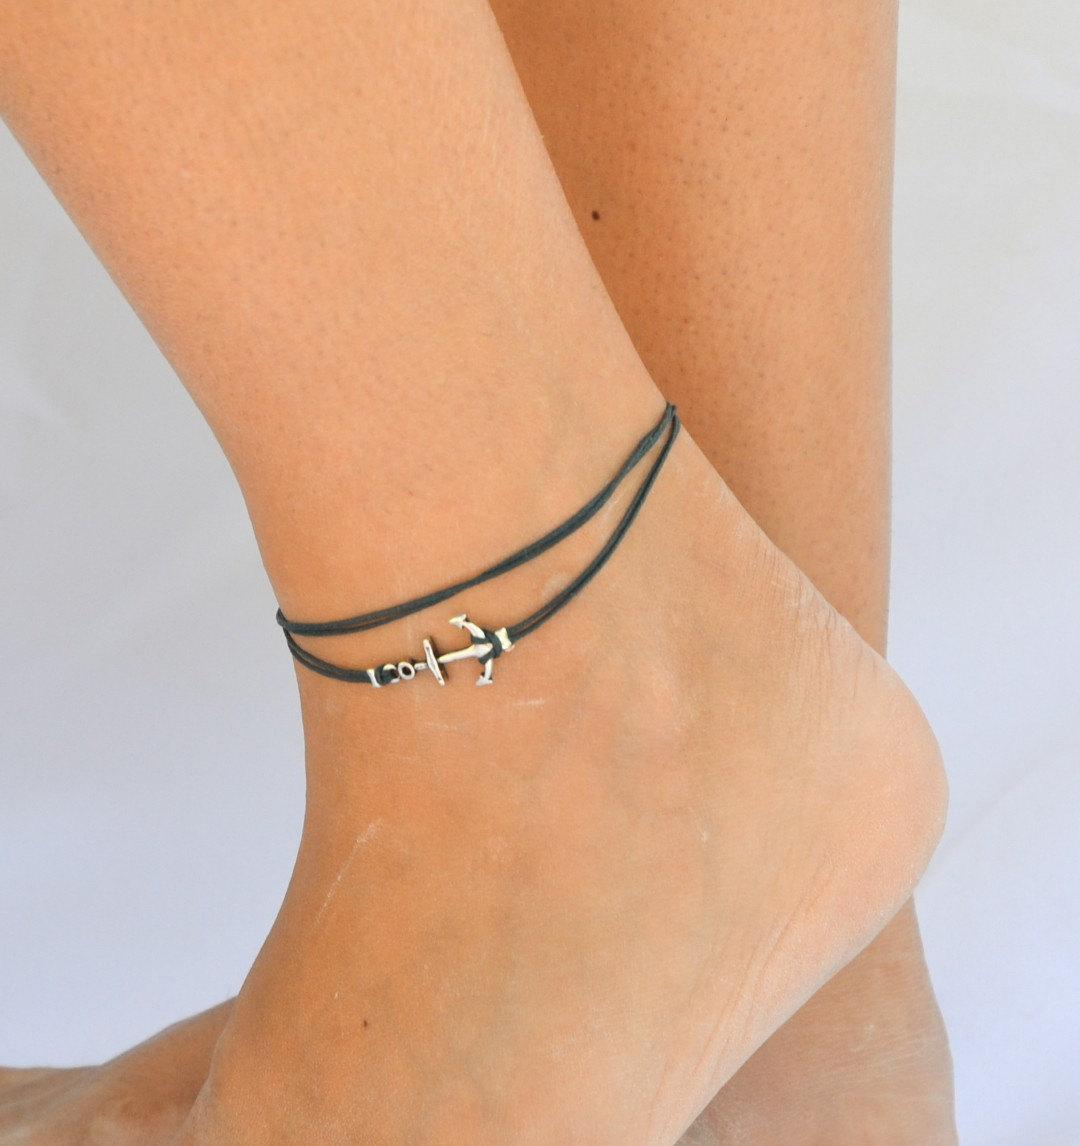 ankle bracelets anchor anklet, blue dainty wrap anklet with a silver anchor charm, blue ankle  bracelet, GBNQHHX